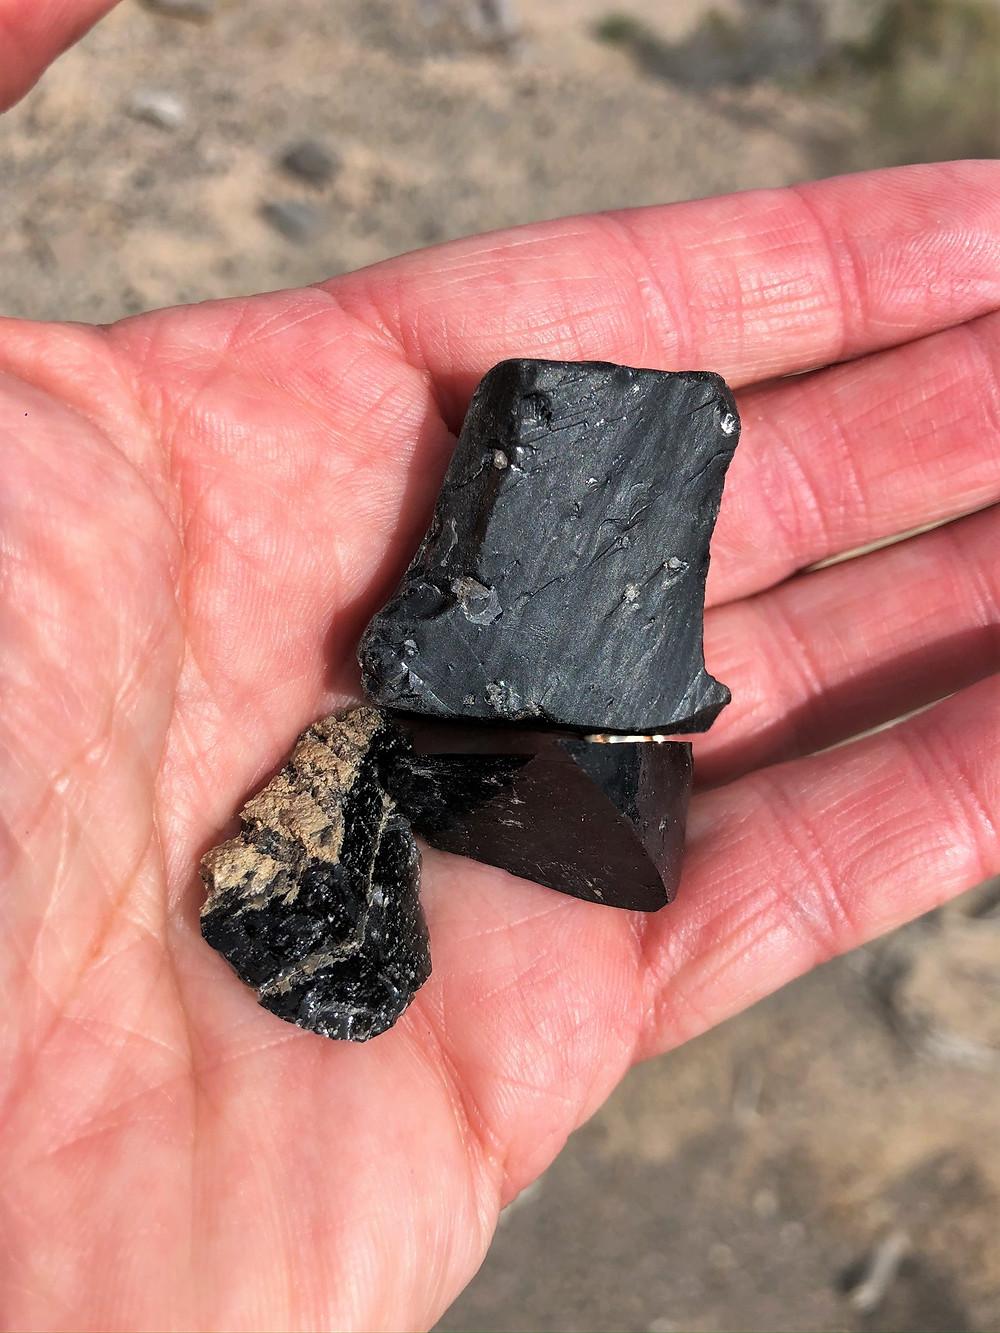 Obsidian rocks from Salton Sea area in California